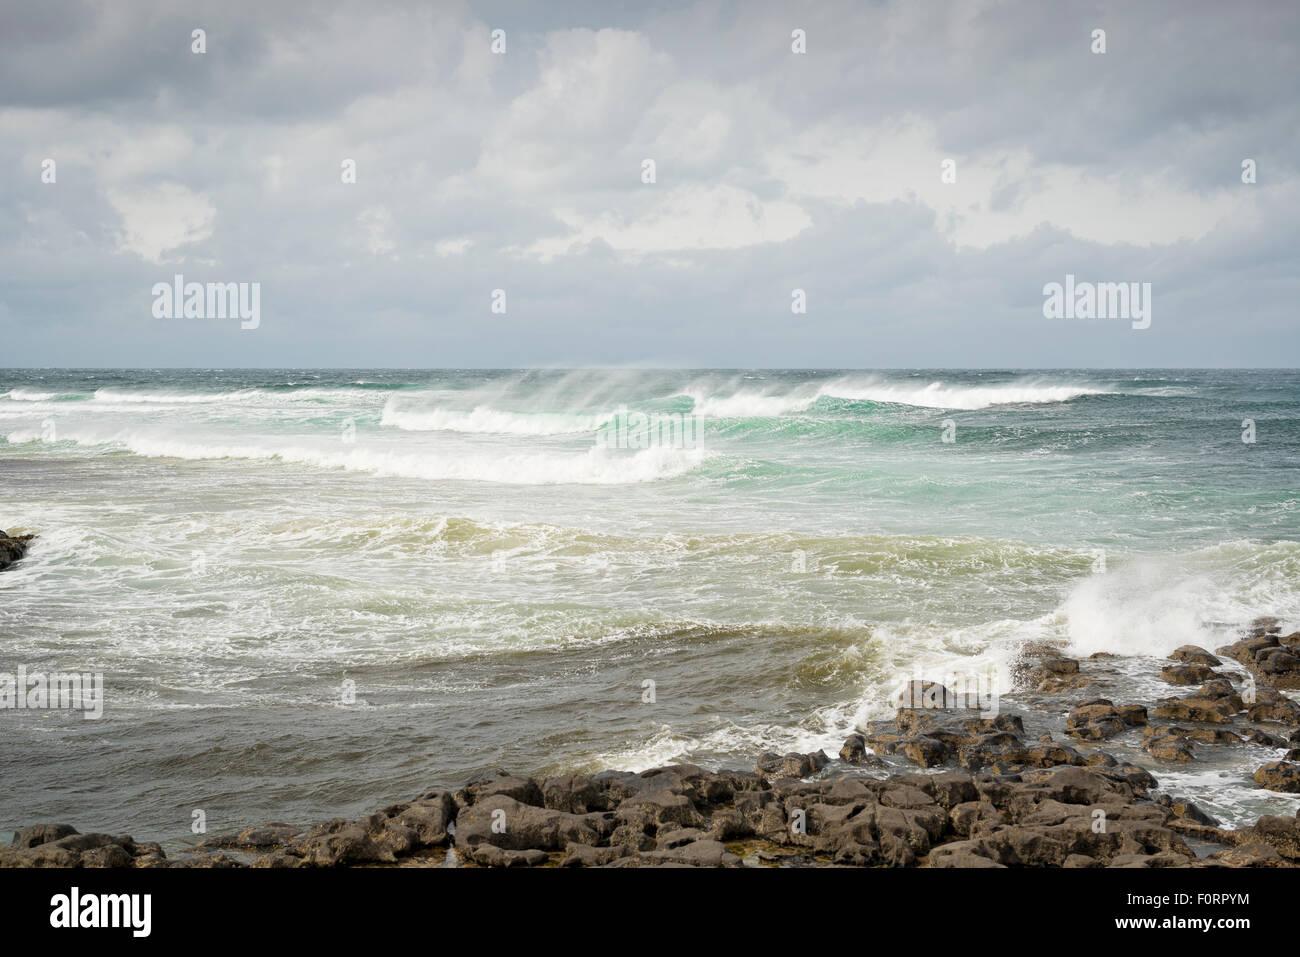 Waves in the Atlantic at Easky Co. Sligo on the west coast of Ireland - Stock Image